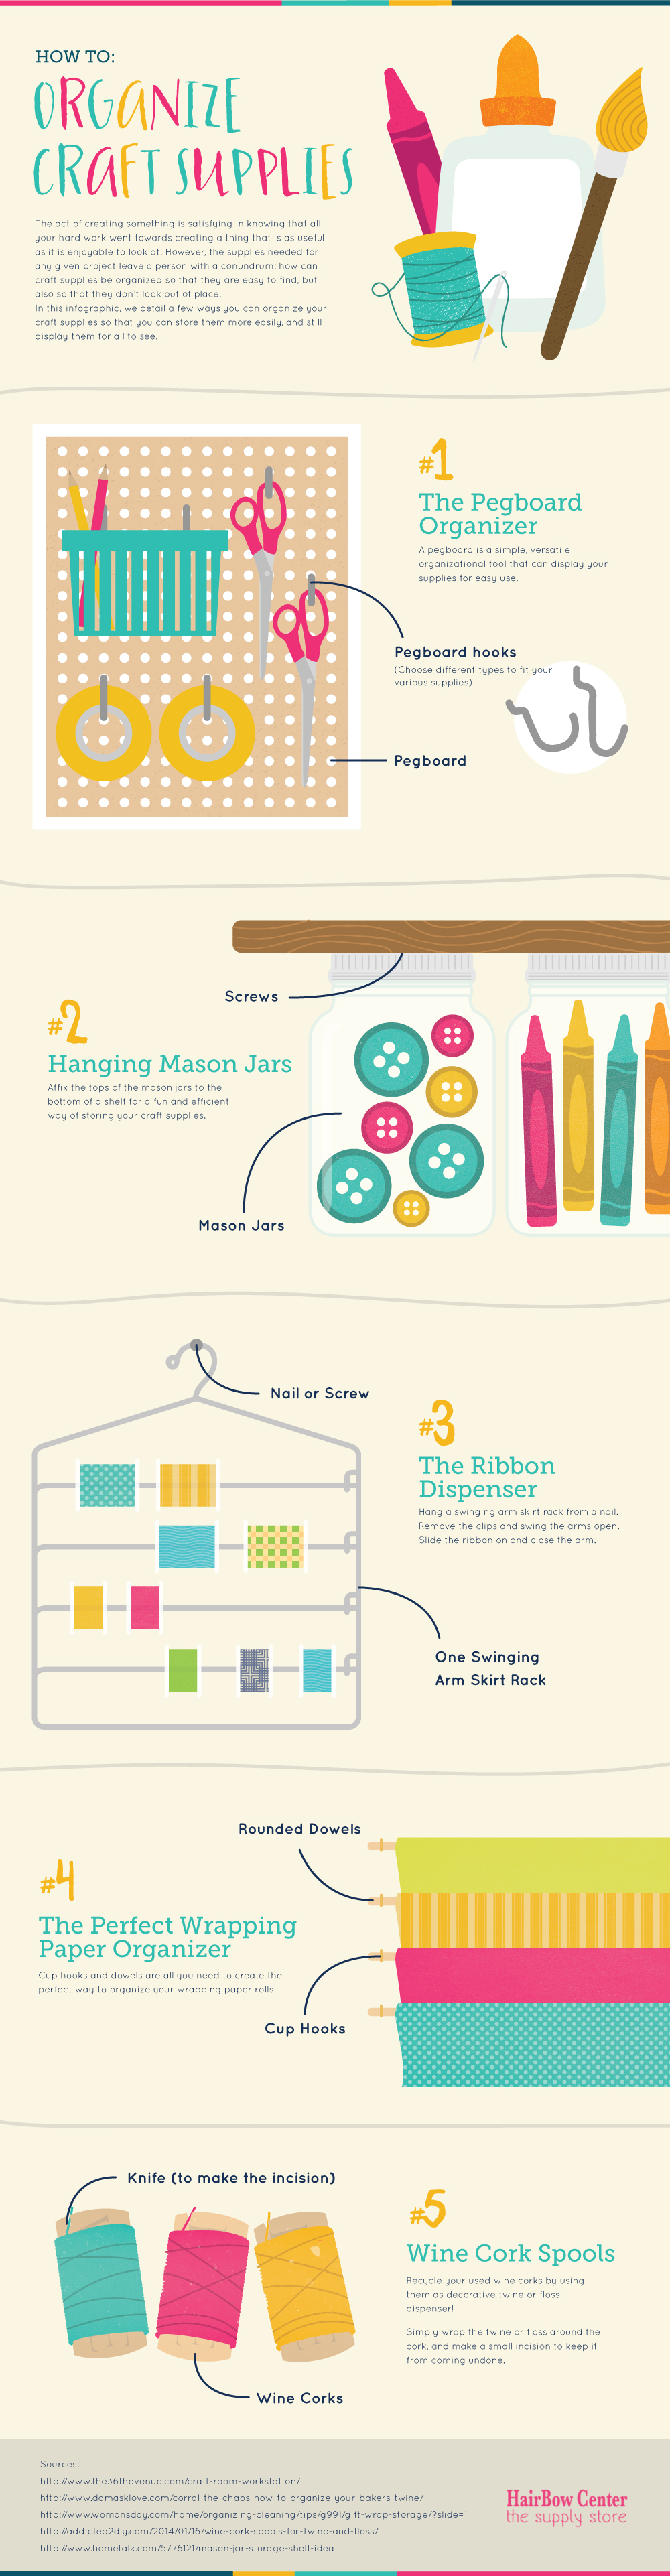 5 Creative Crafting Storage Ideas